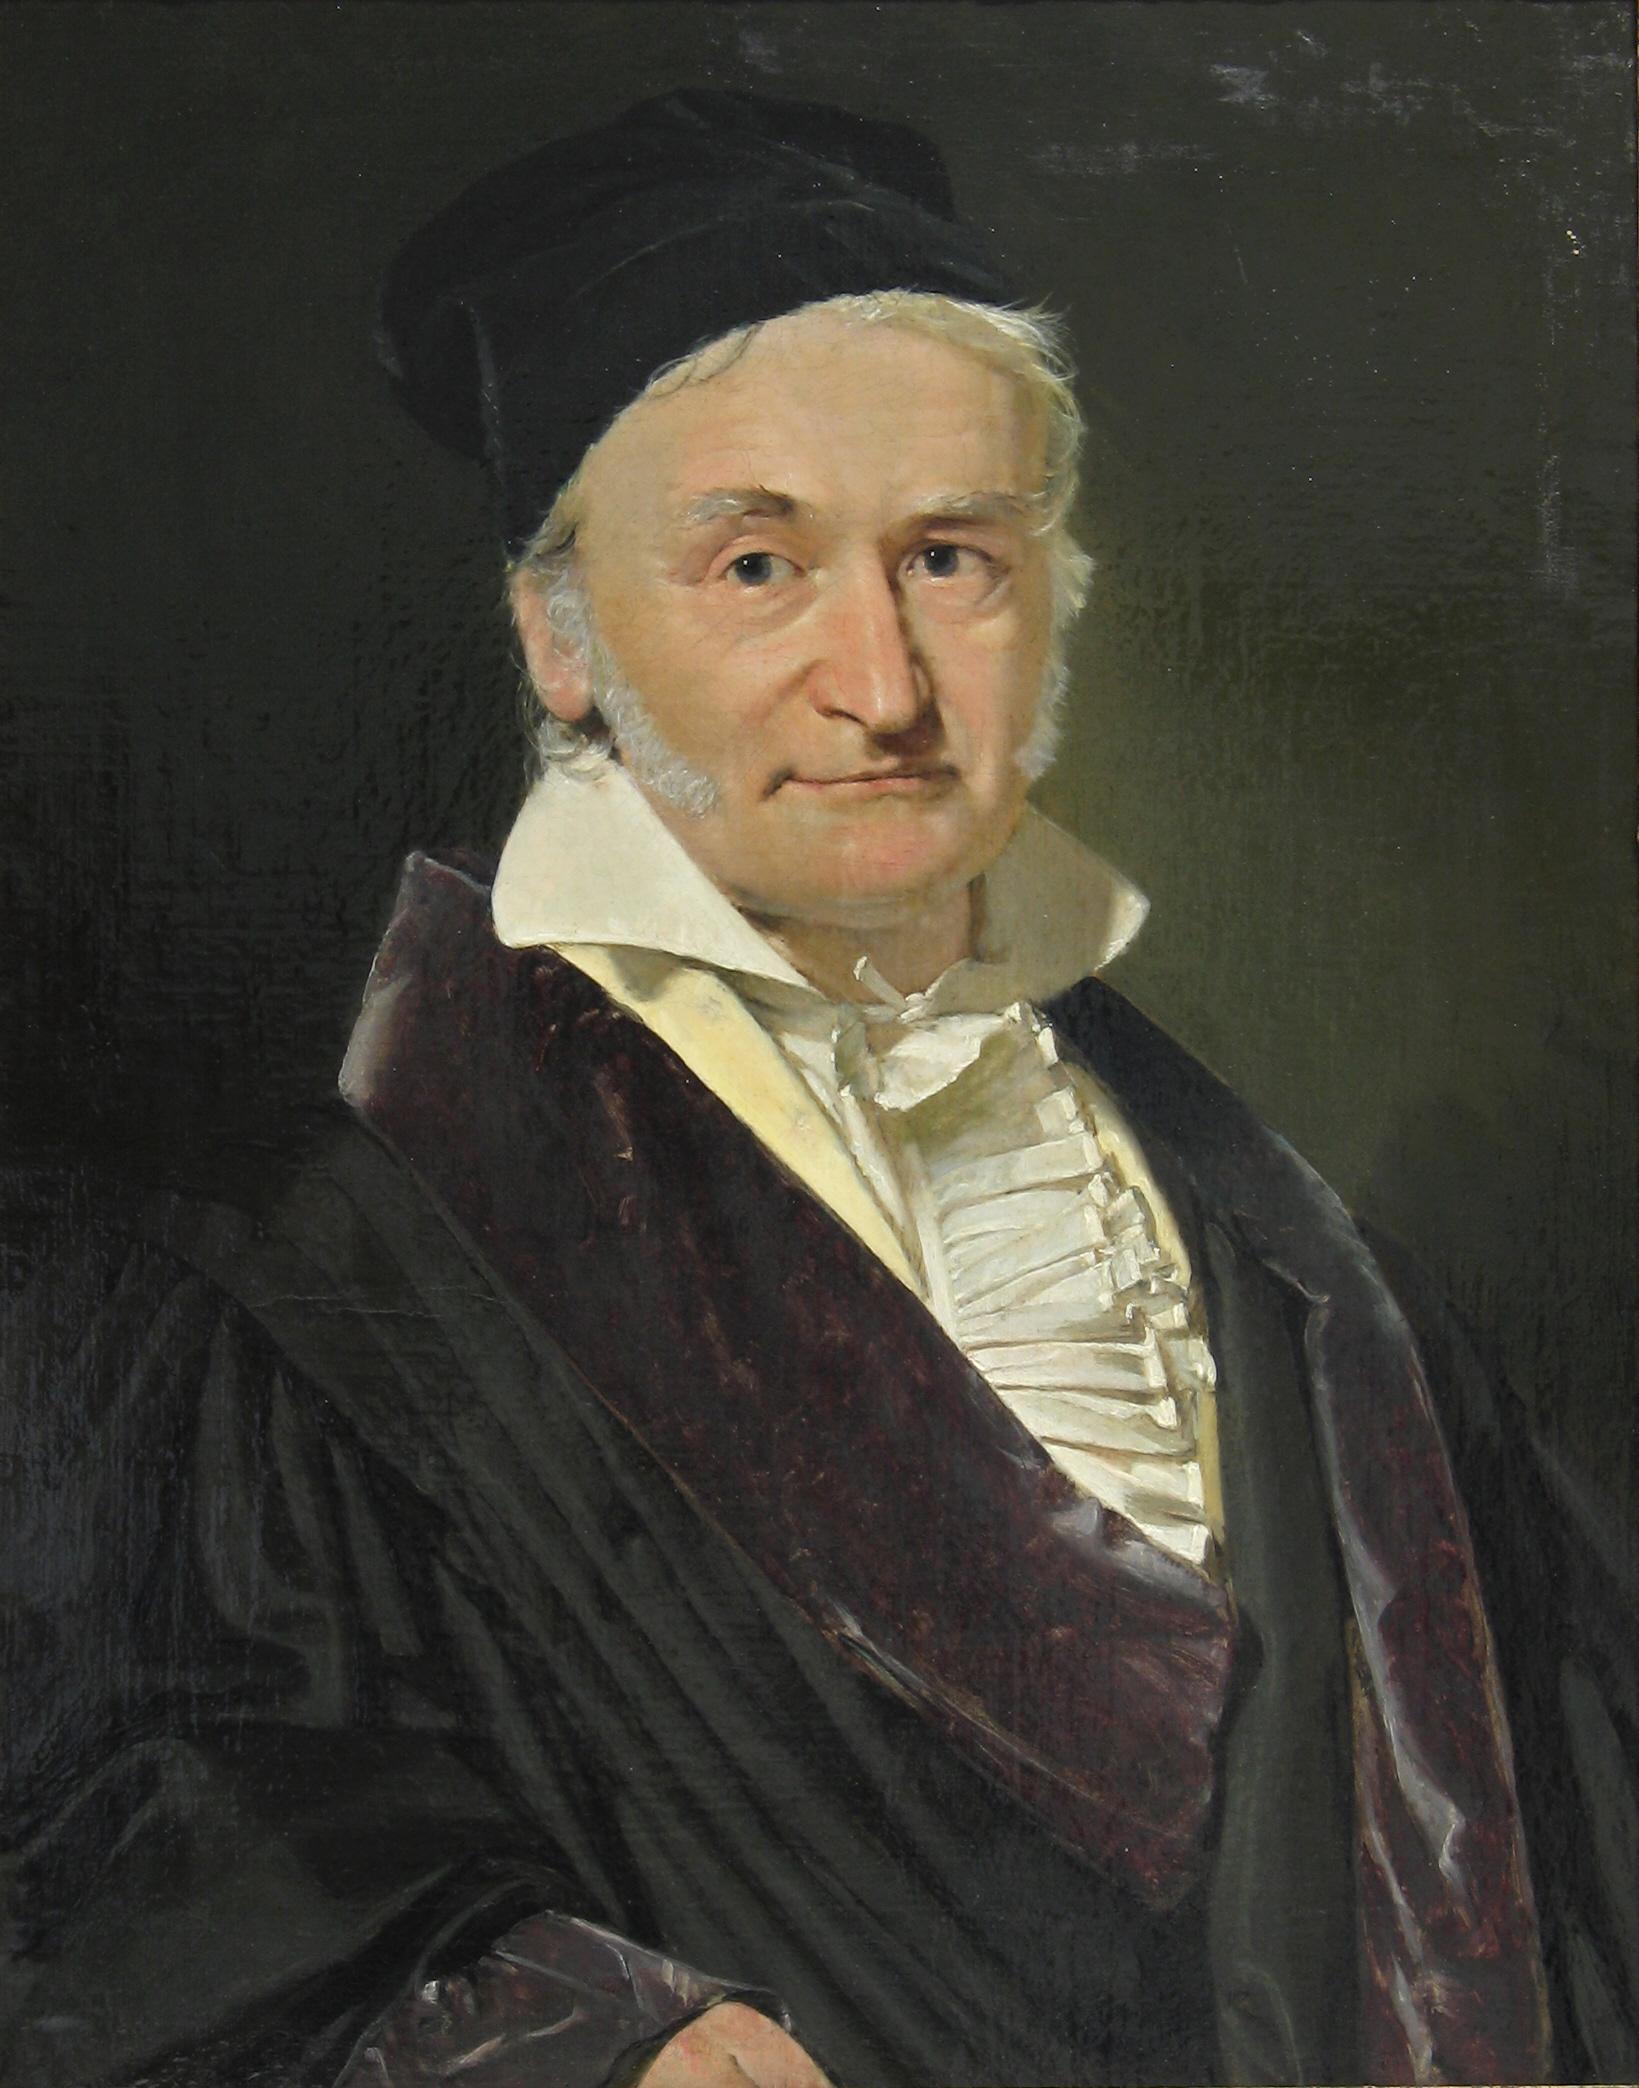 Carl Friedrich Gauss Wikipedia La Enciclopedia Libre